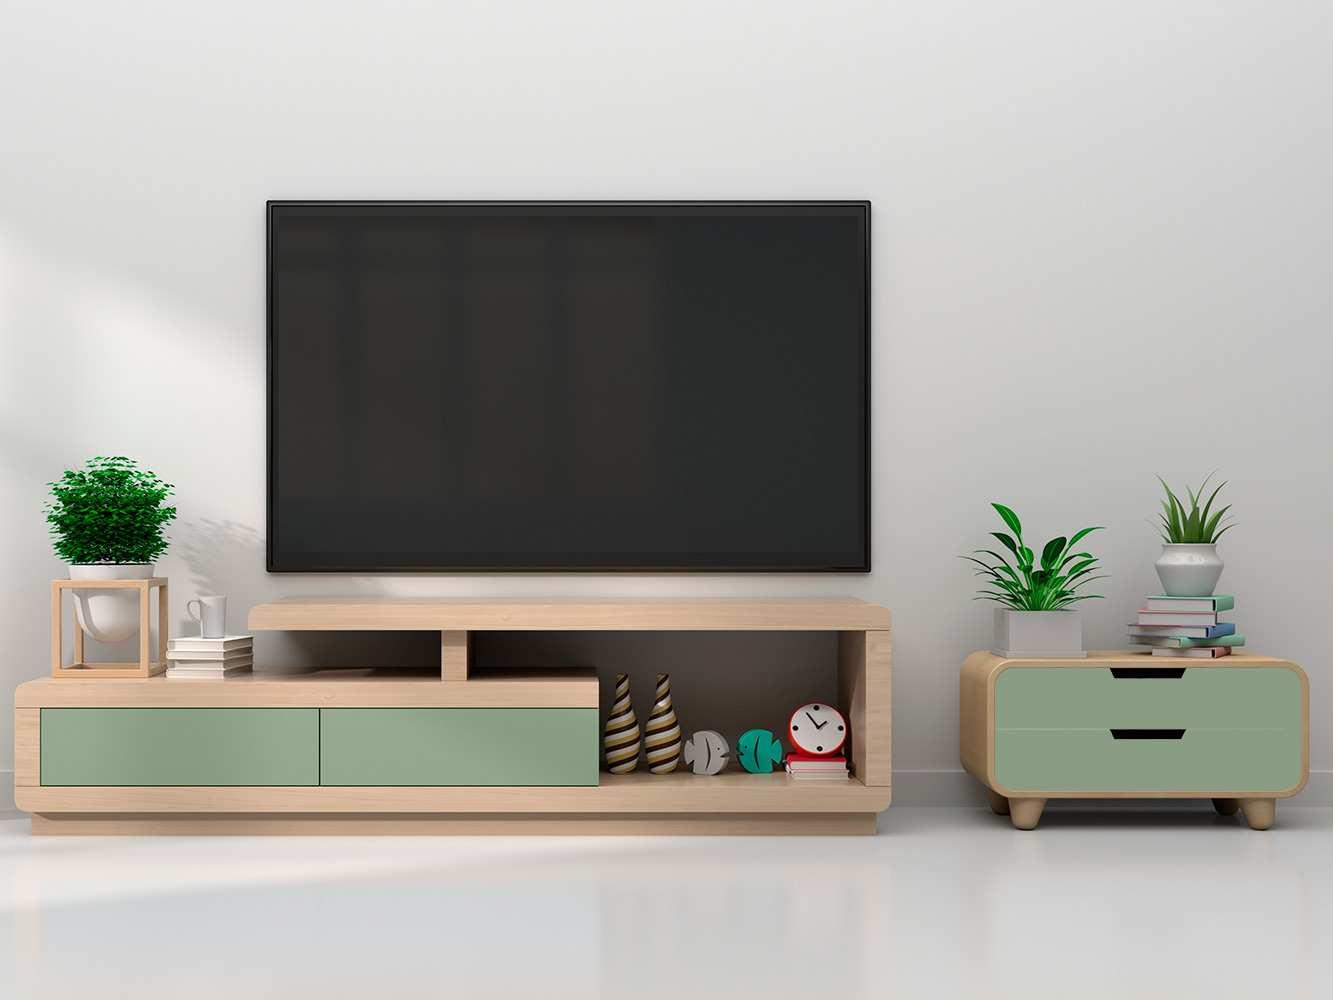 Vinilo Decorativo Mueble Verde Claro | Carteles XXL - Impresión carteleria publicitaria